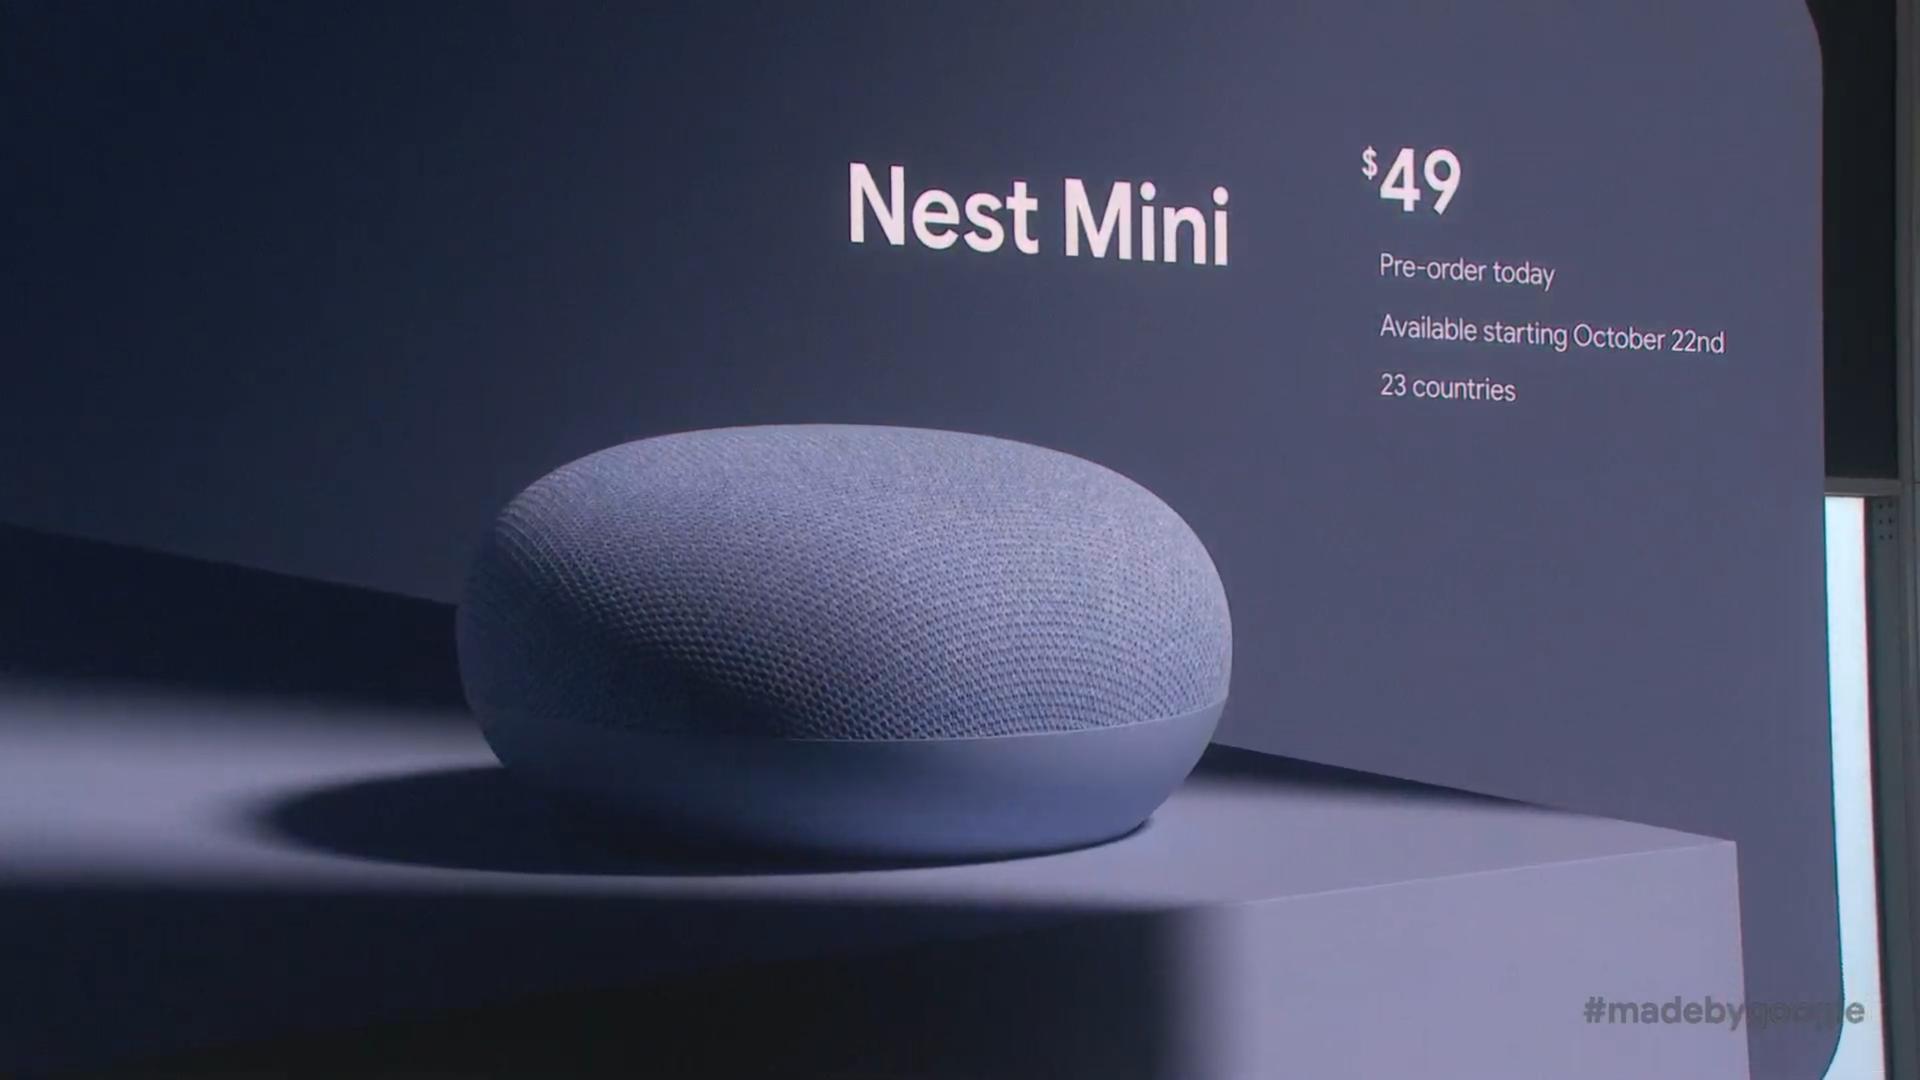 nest mini price Made by Google 19